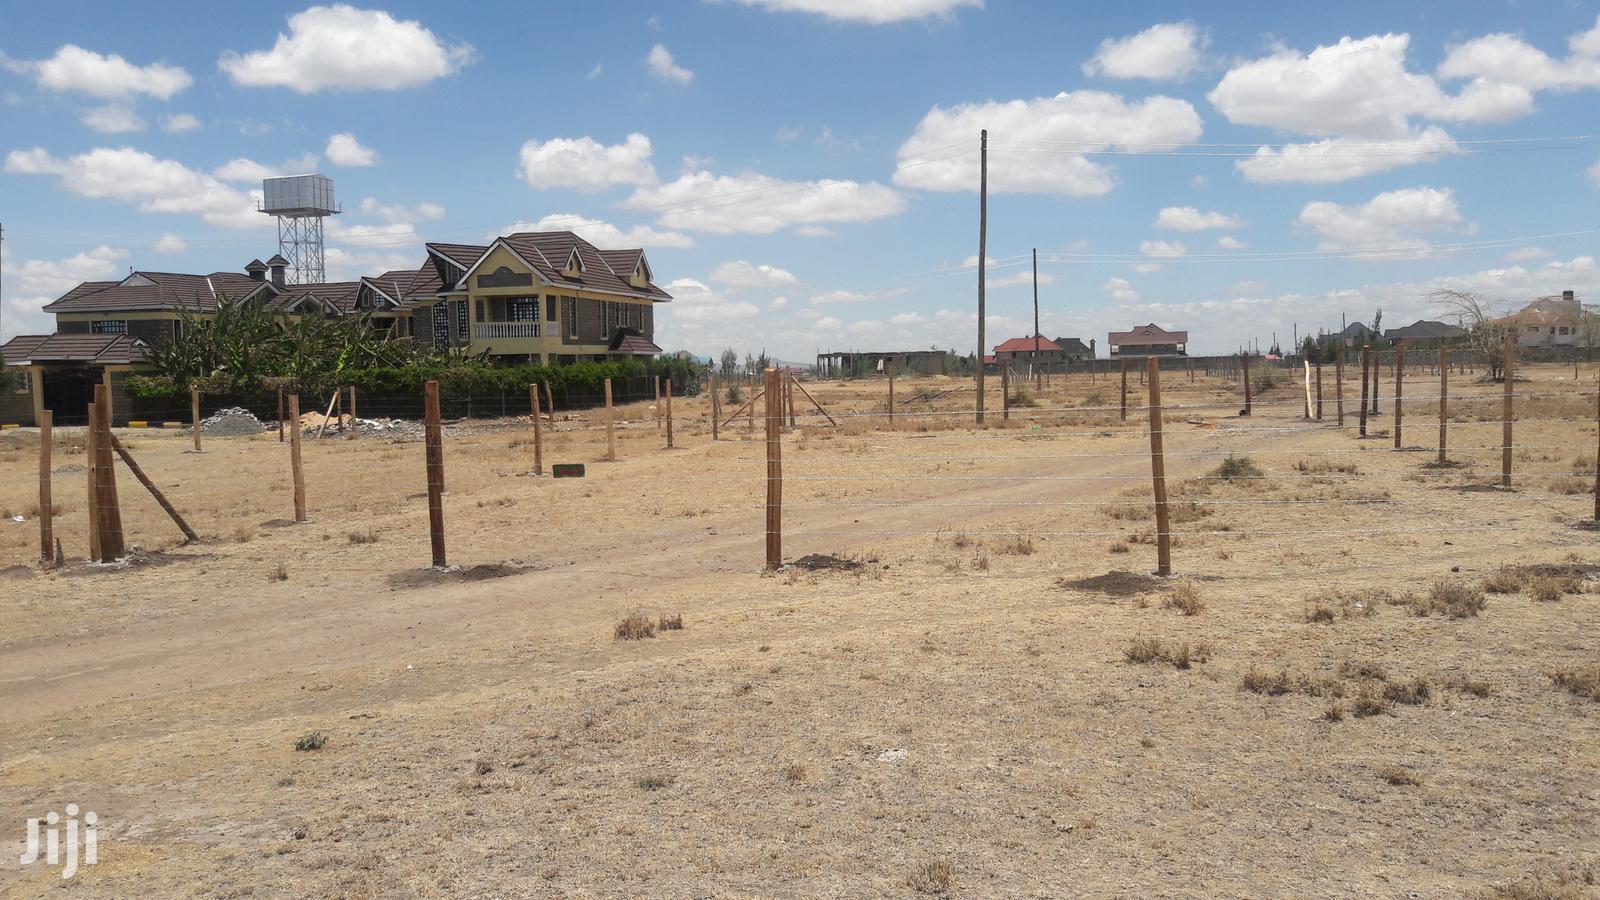 1/4 Acre Plot - Police Sacco Gardens (Phase II) Kitengela | Land & Plots For Sale for sale in Kitengela, Kajiado, Kenya